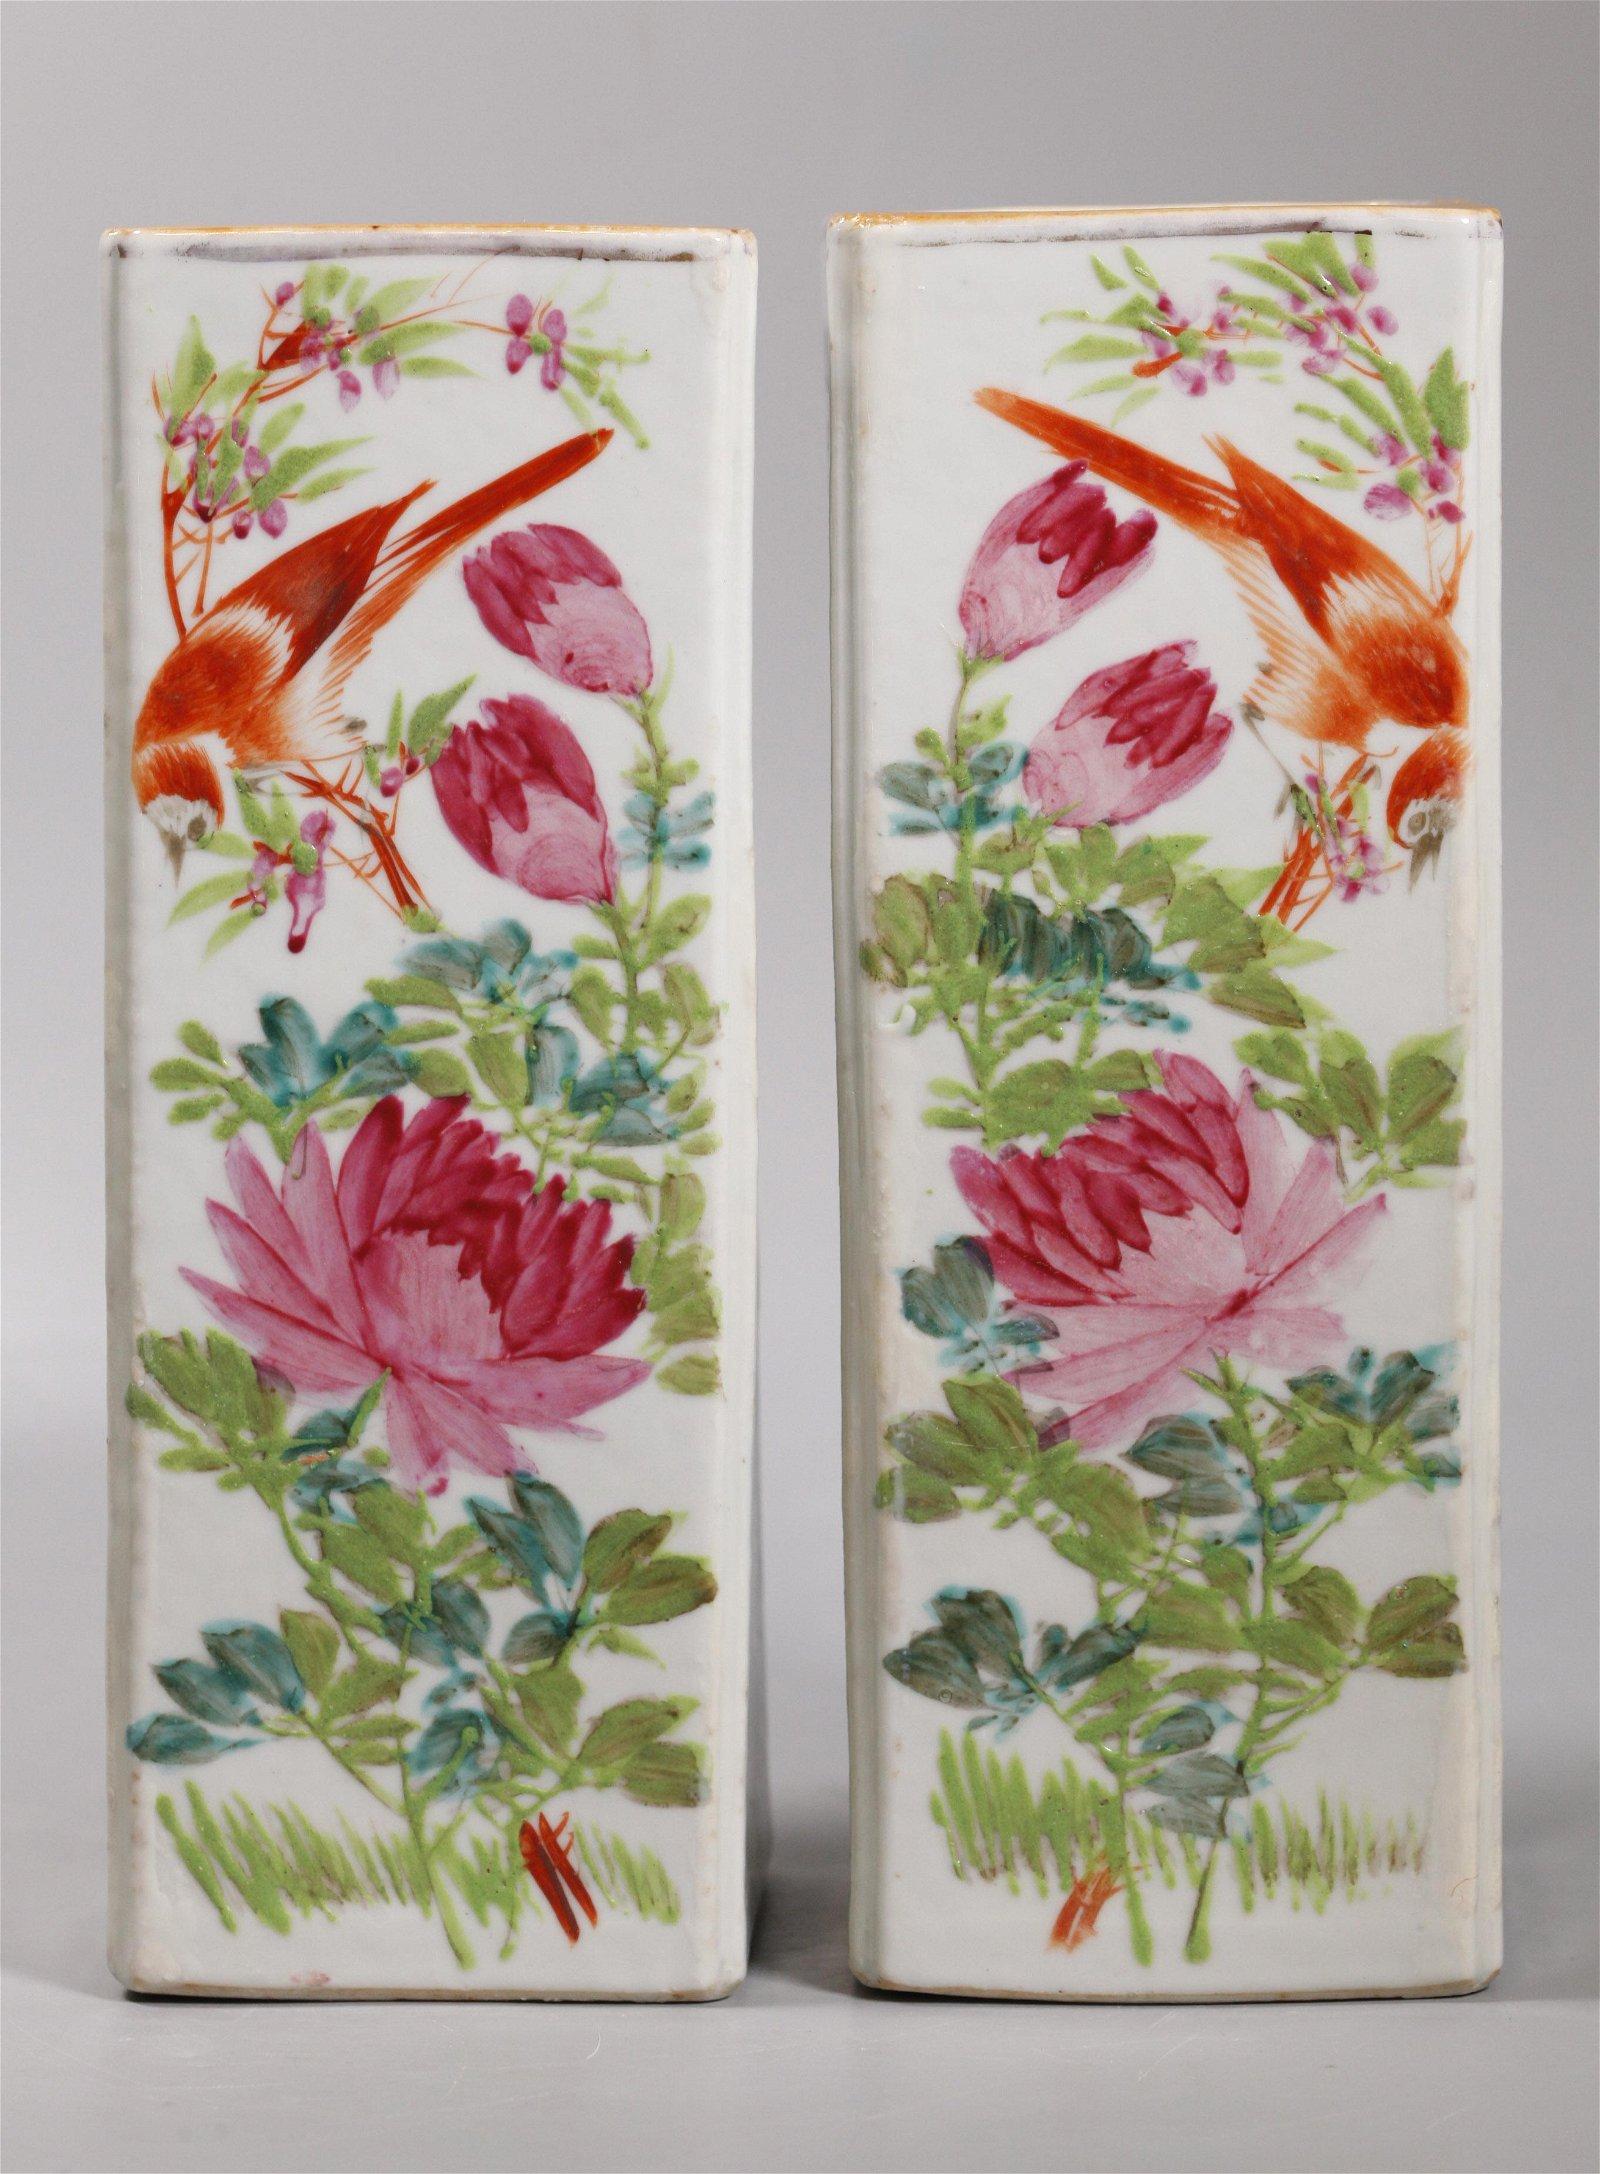 Shao Shanshi; Pr Chinese Art Porcelain Hat Stands